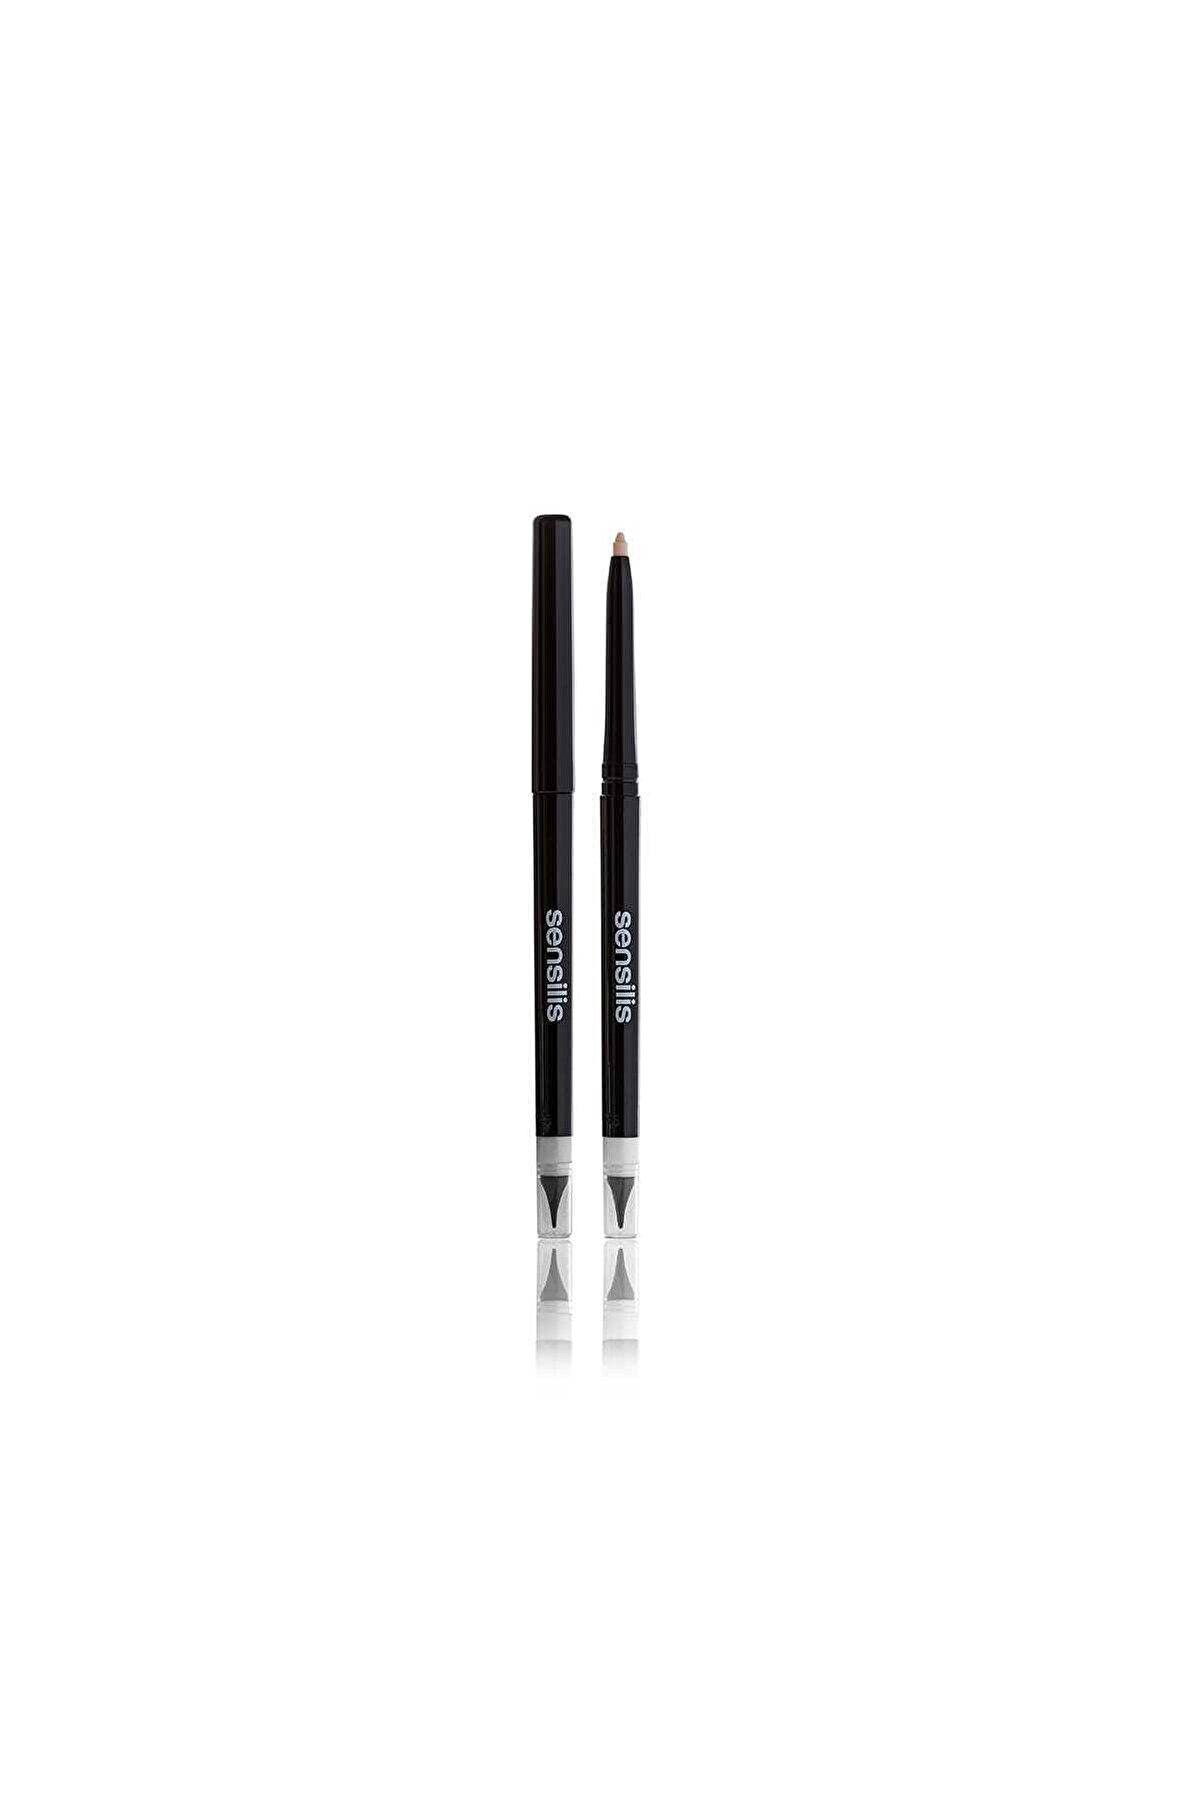 sensilis Dudak Kalemi - Perfect Line Lip Pencil 01 Transparent